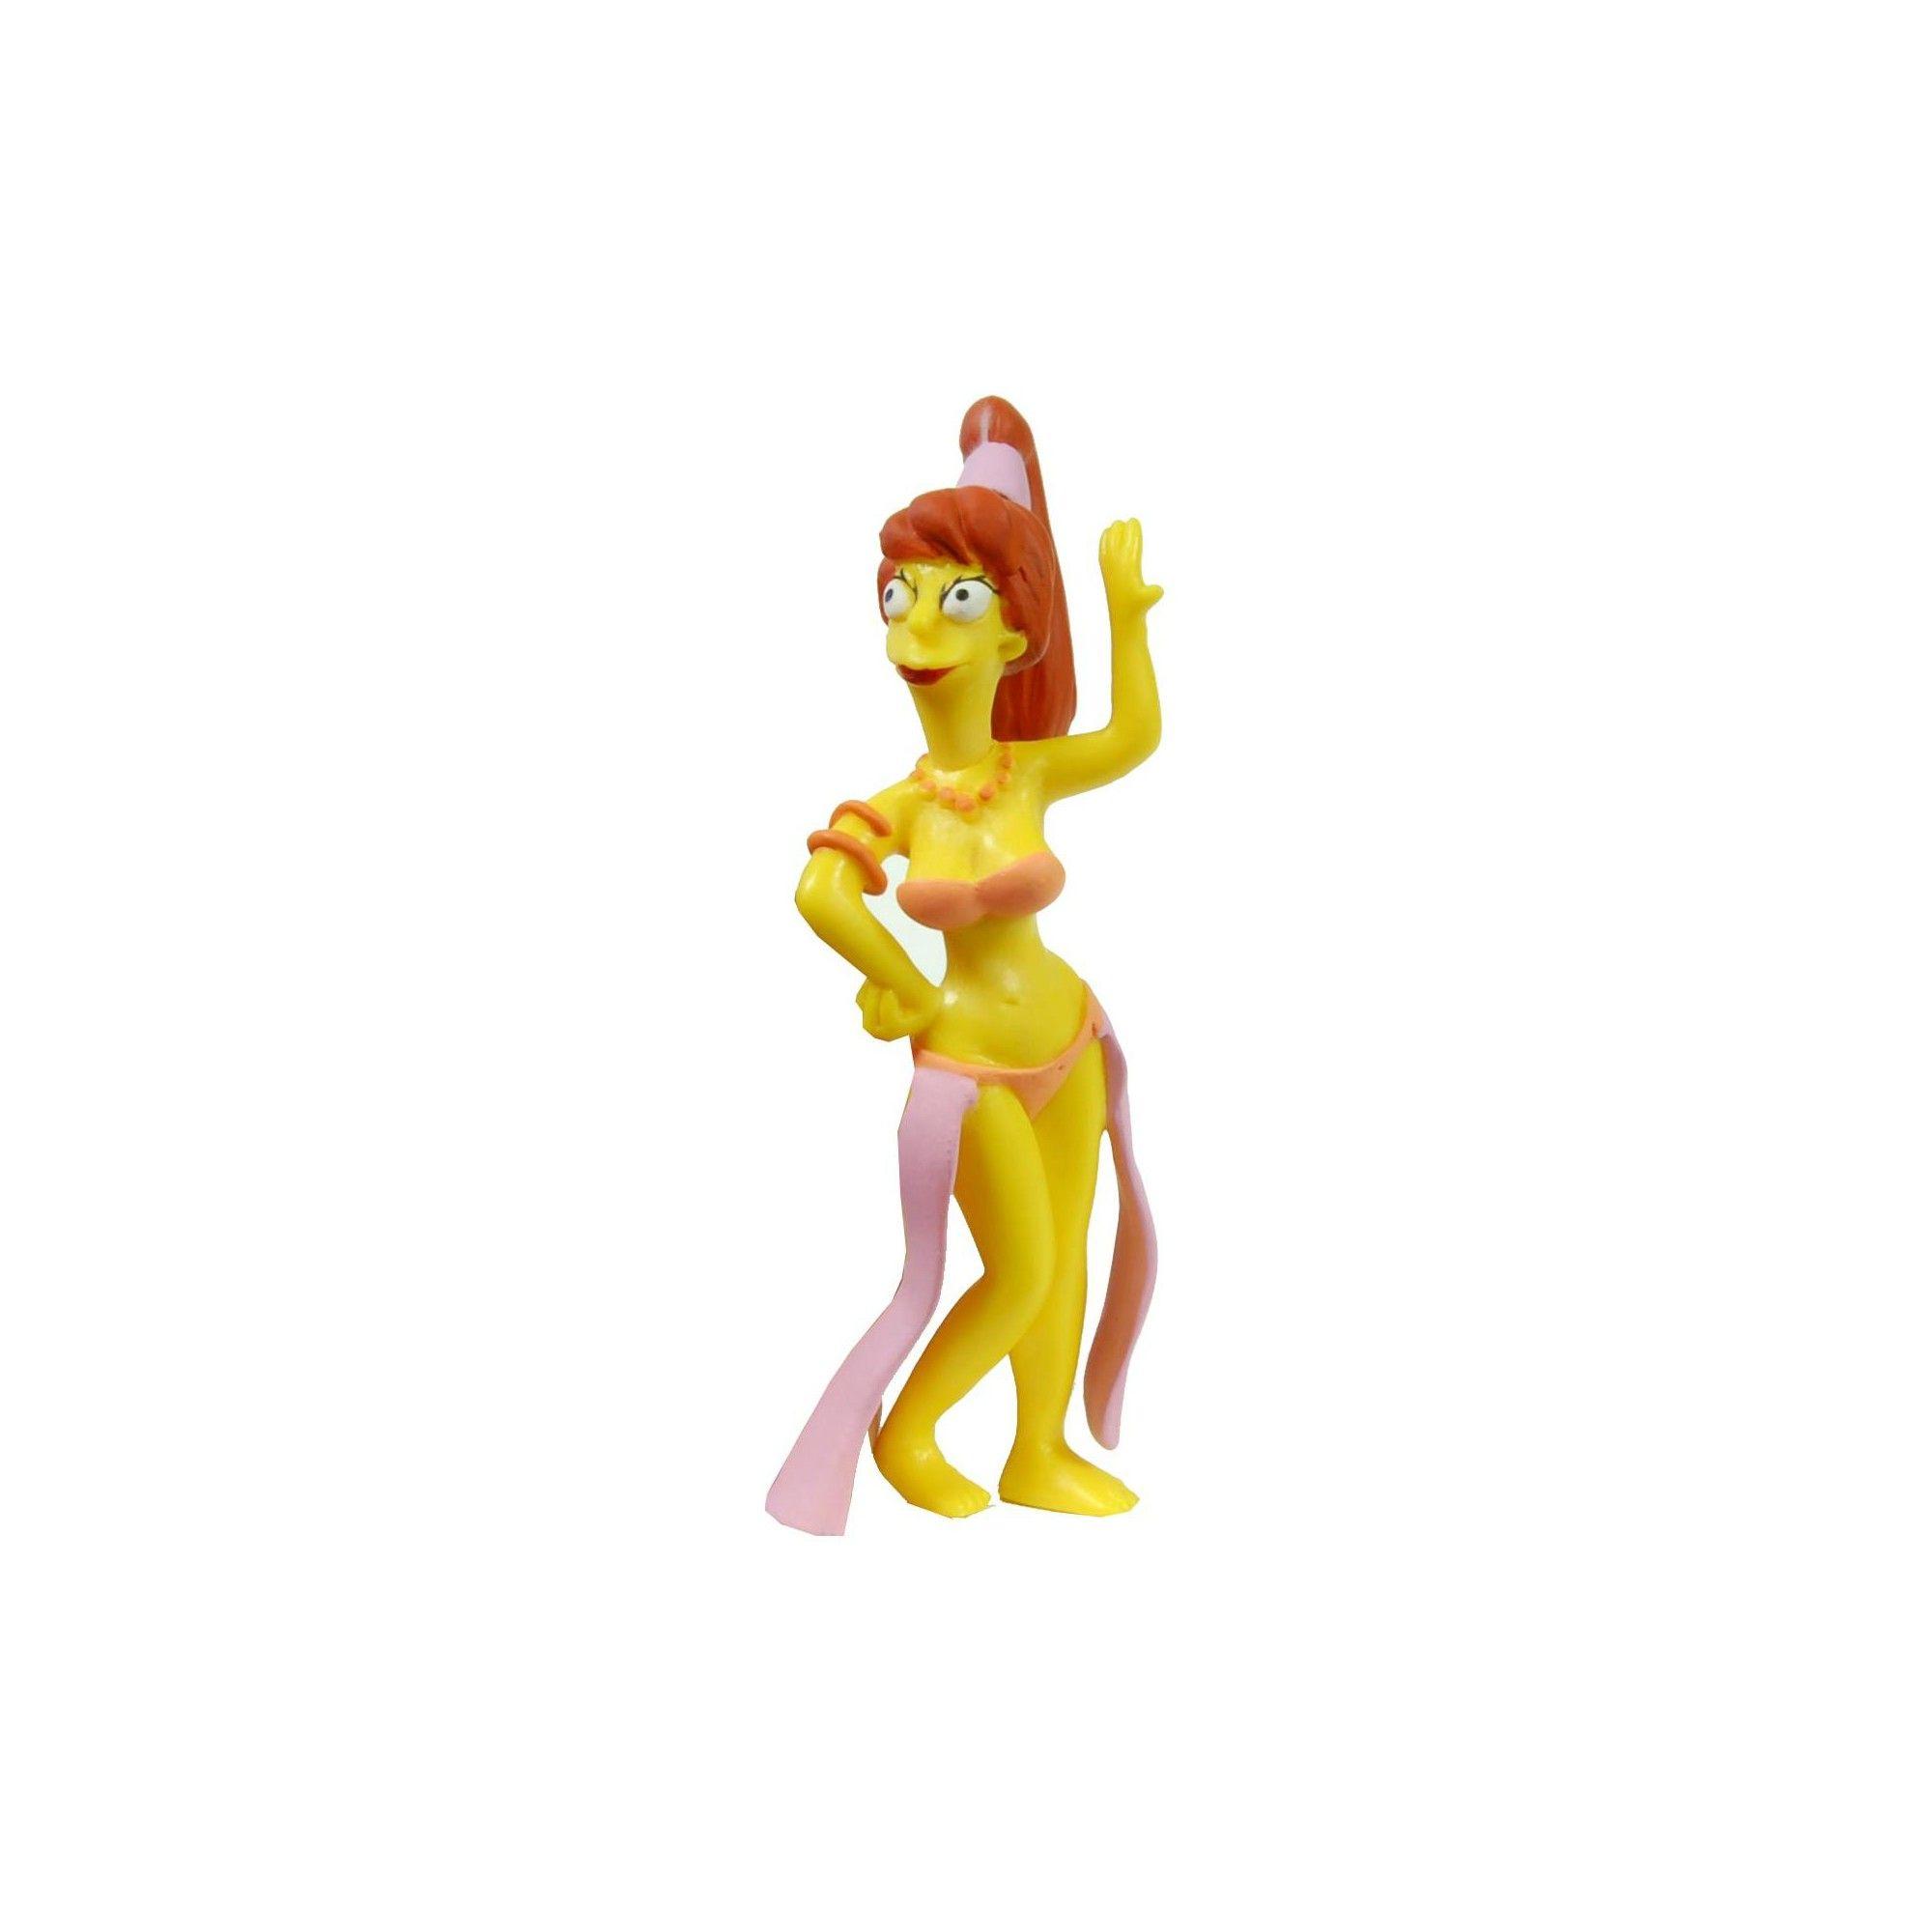 Simpsons 20th Anniversary Collector Figure Season 1-5 Princess Kashmir